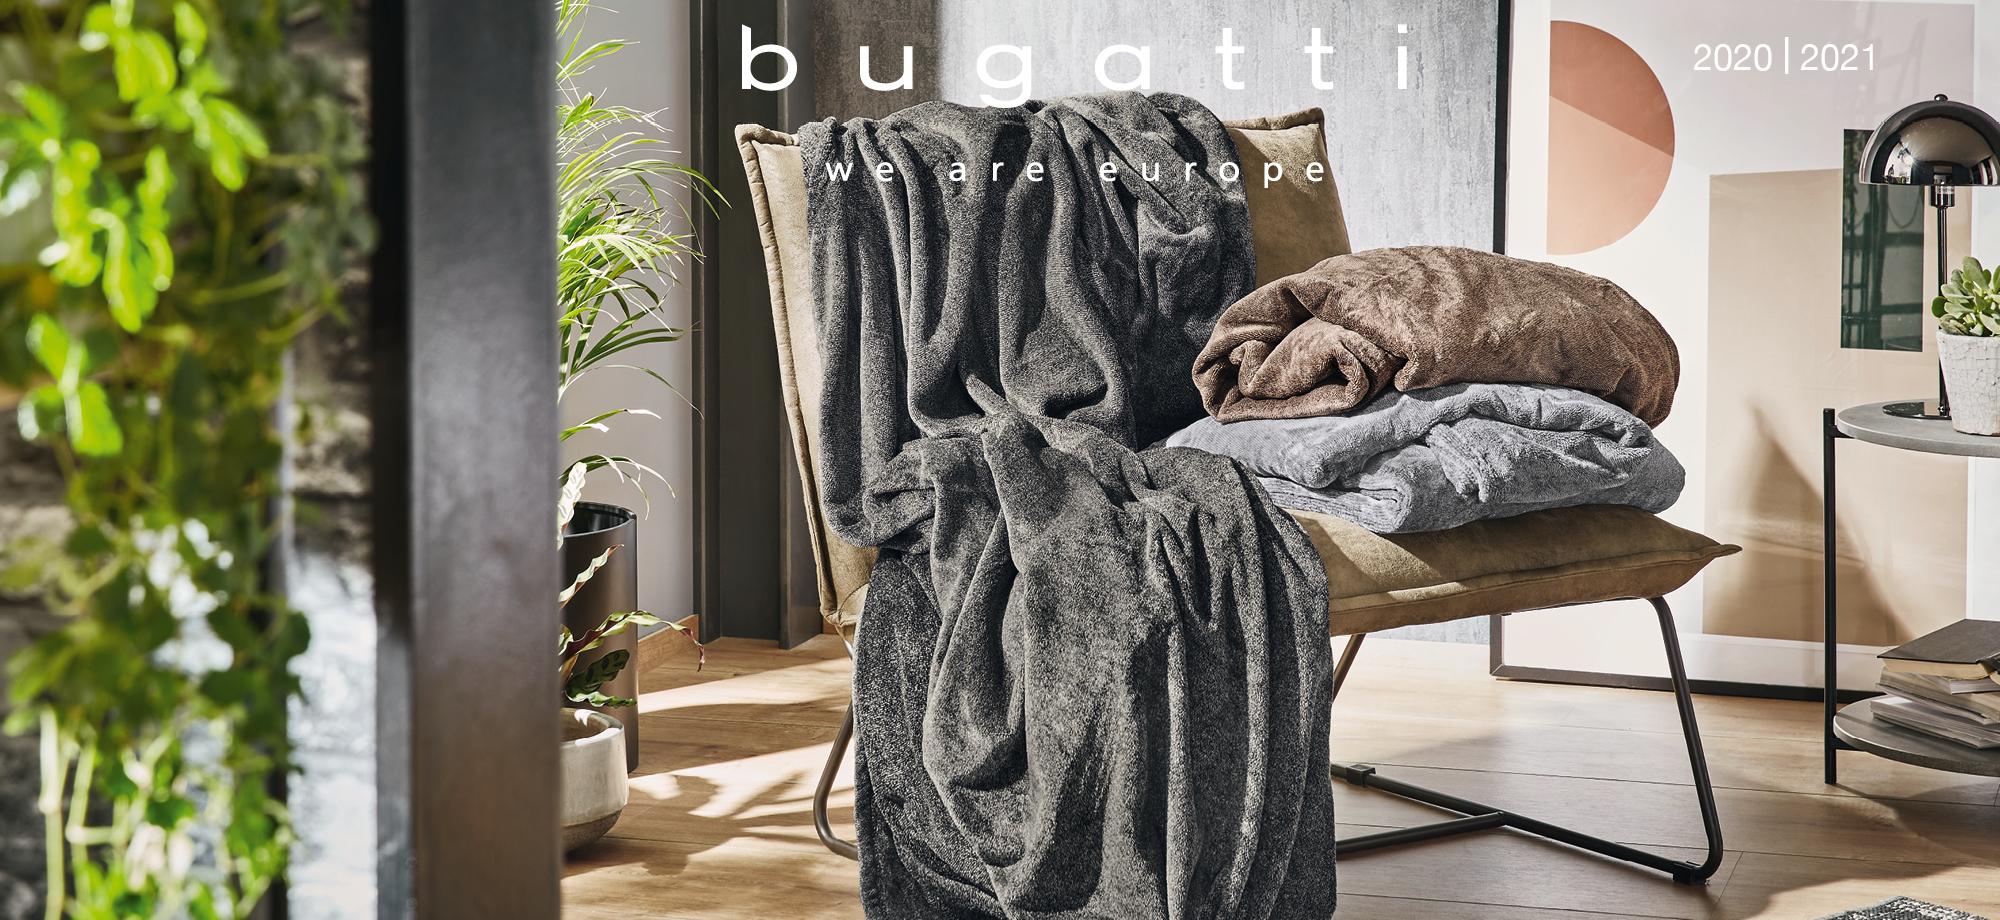 Onlineshop-Titel-bugatti-2020-214